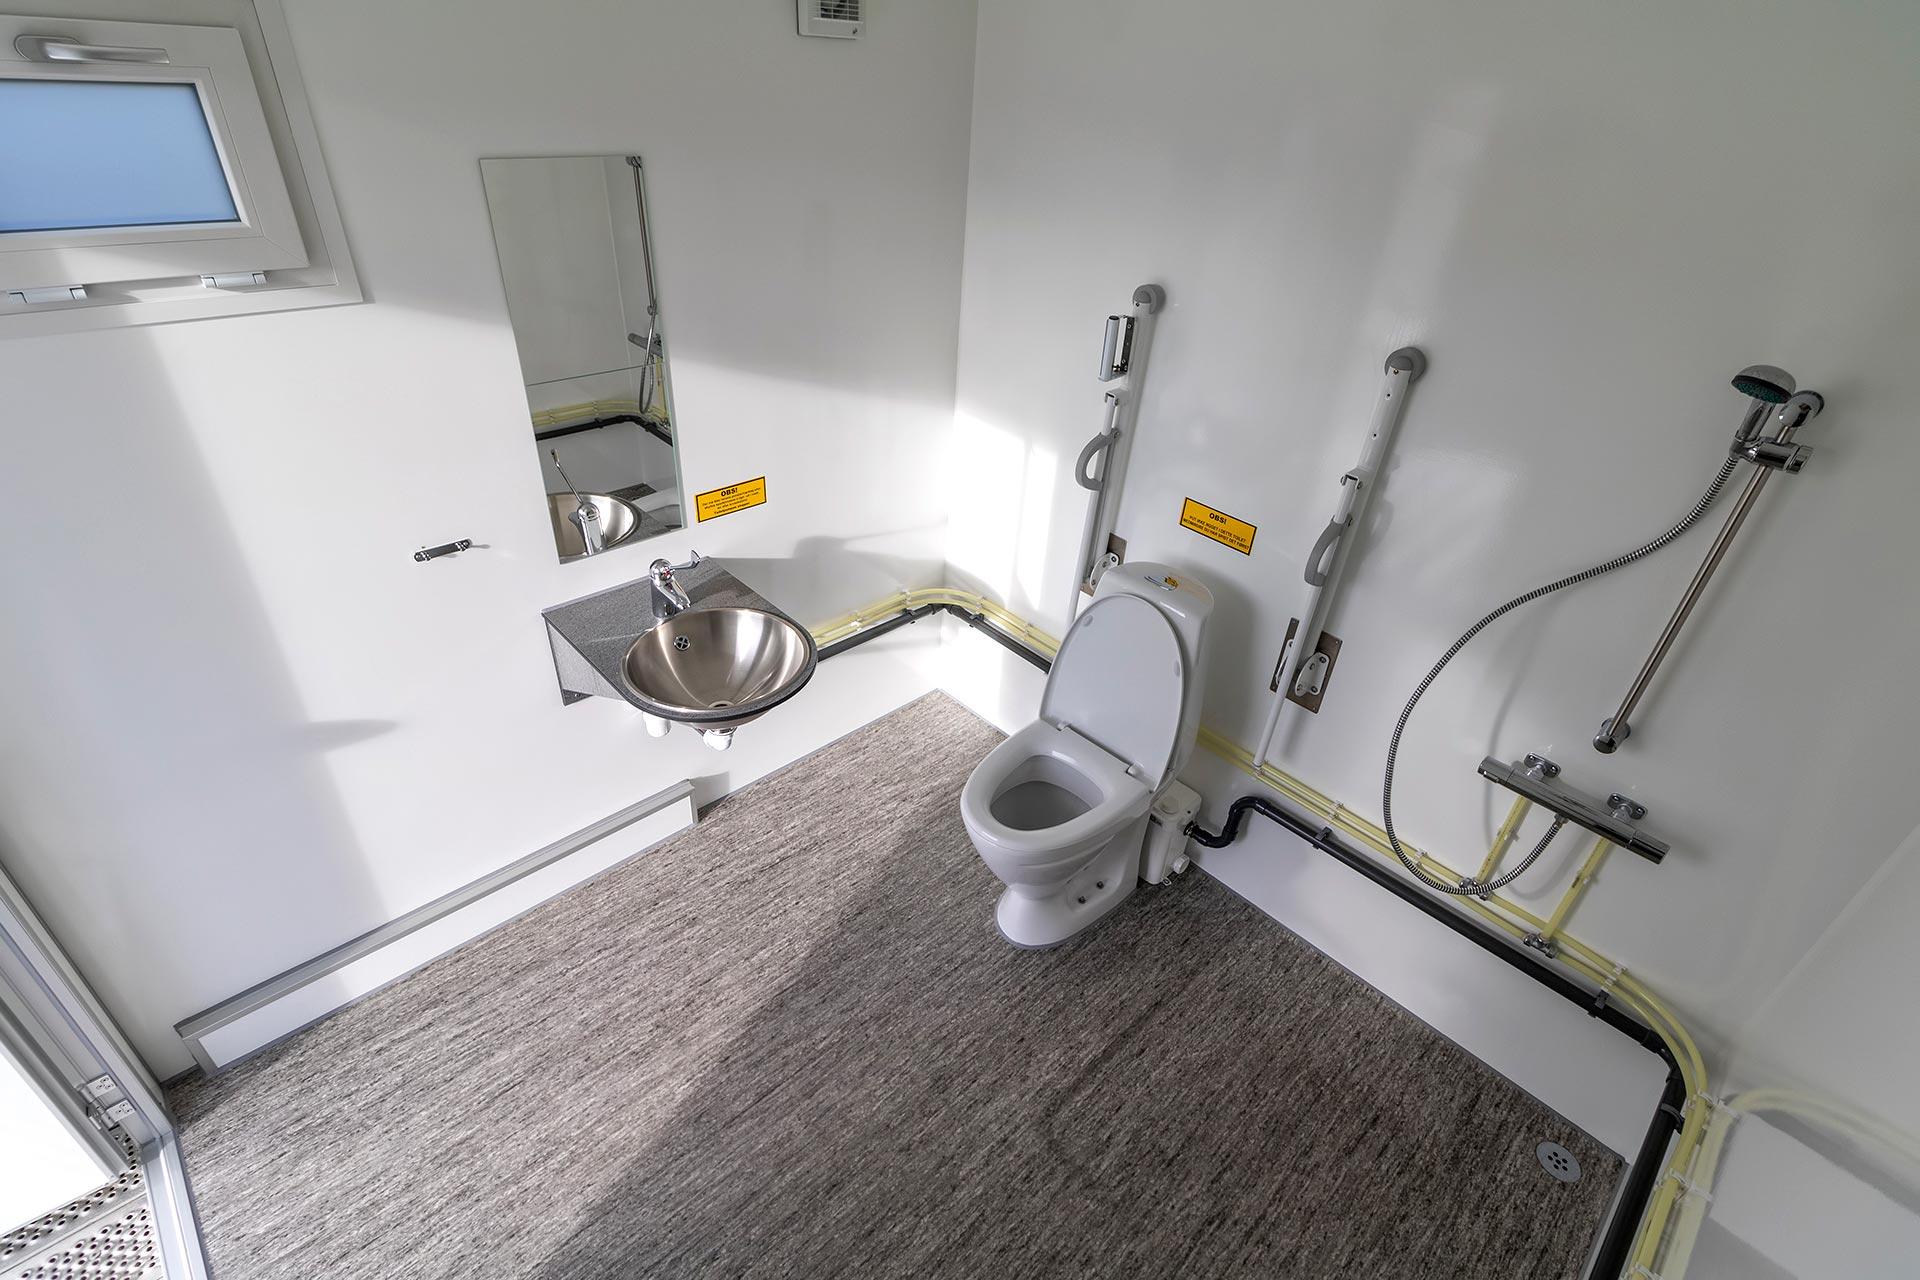 Handicap toiletvogn indefra